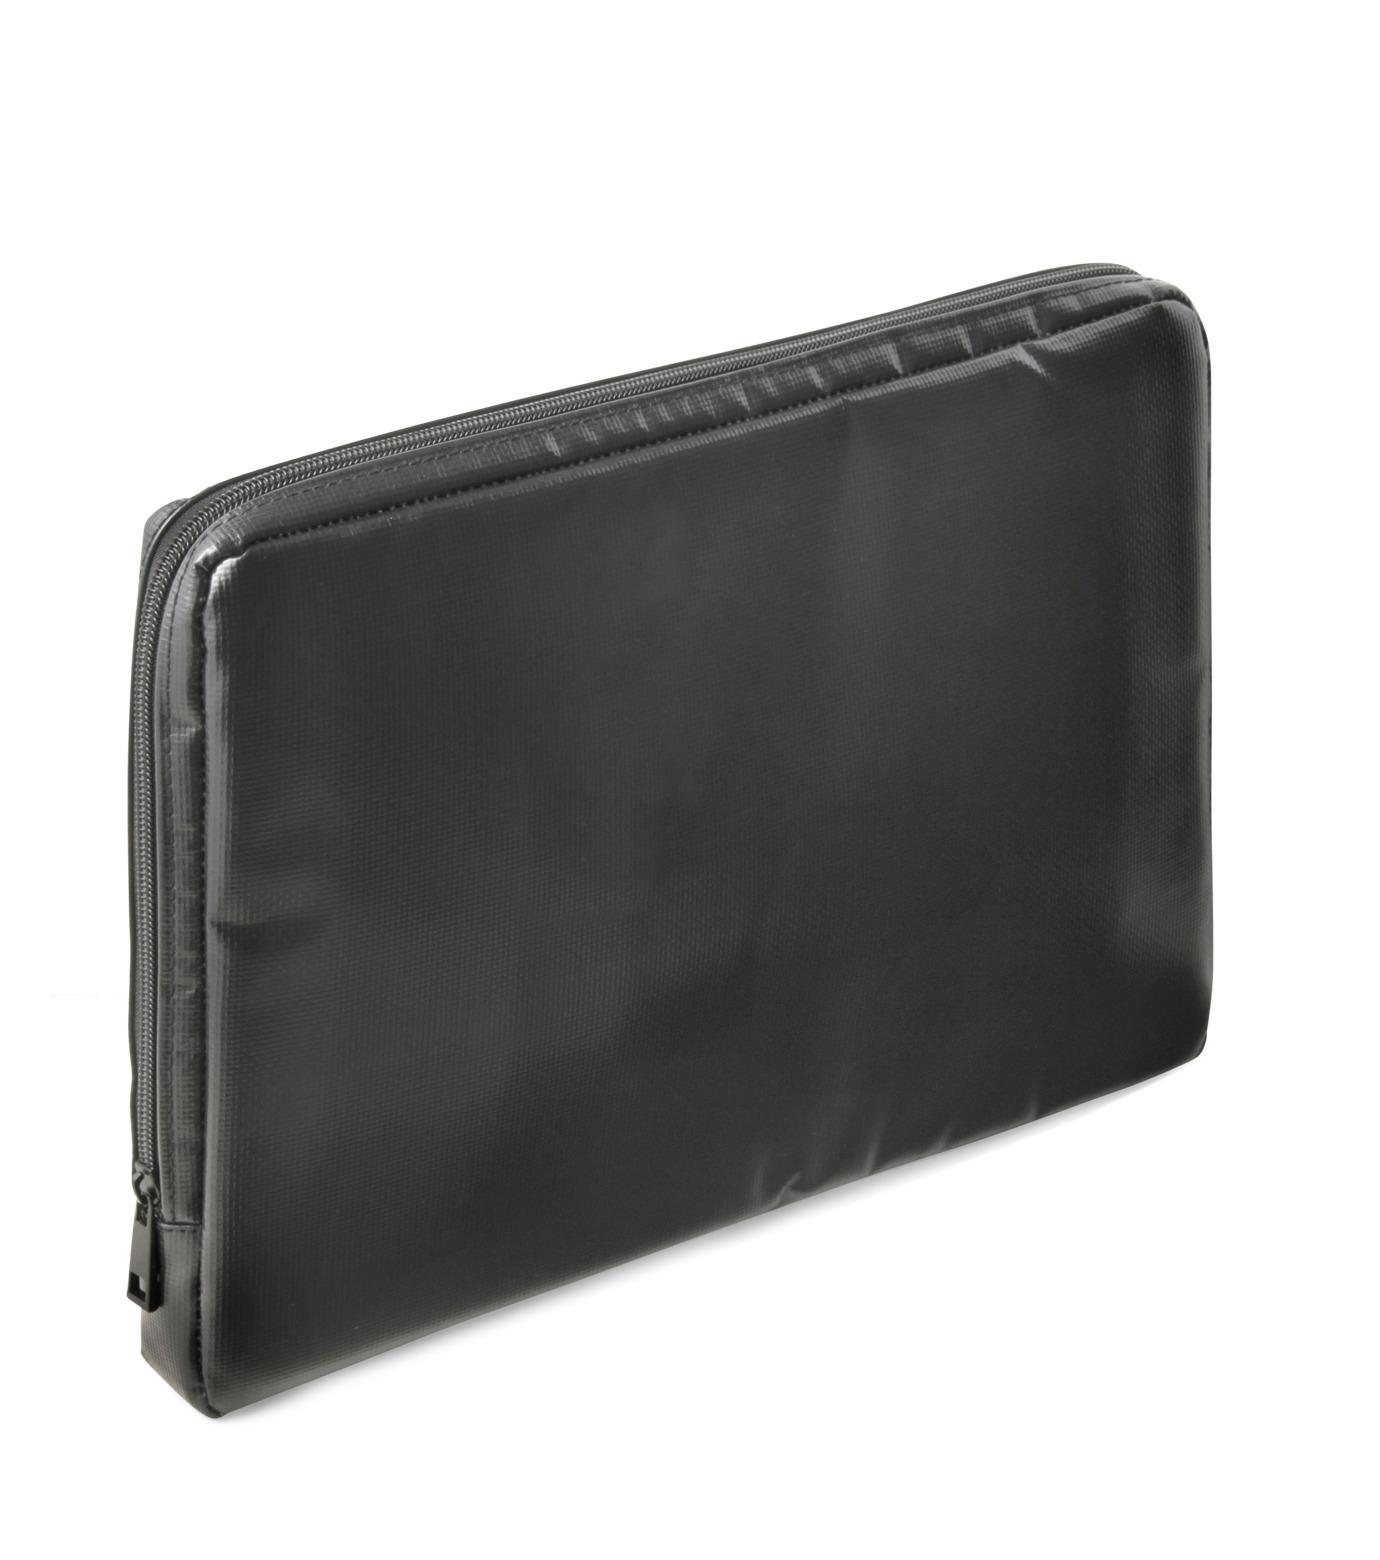 CUBBIC(キュビック)のLaptop case 13inch-BLACK(ケース/cases)-PC-CASE-13 拡大詳細画像2